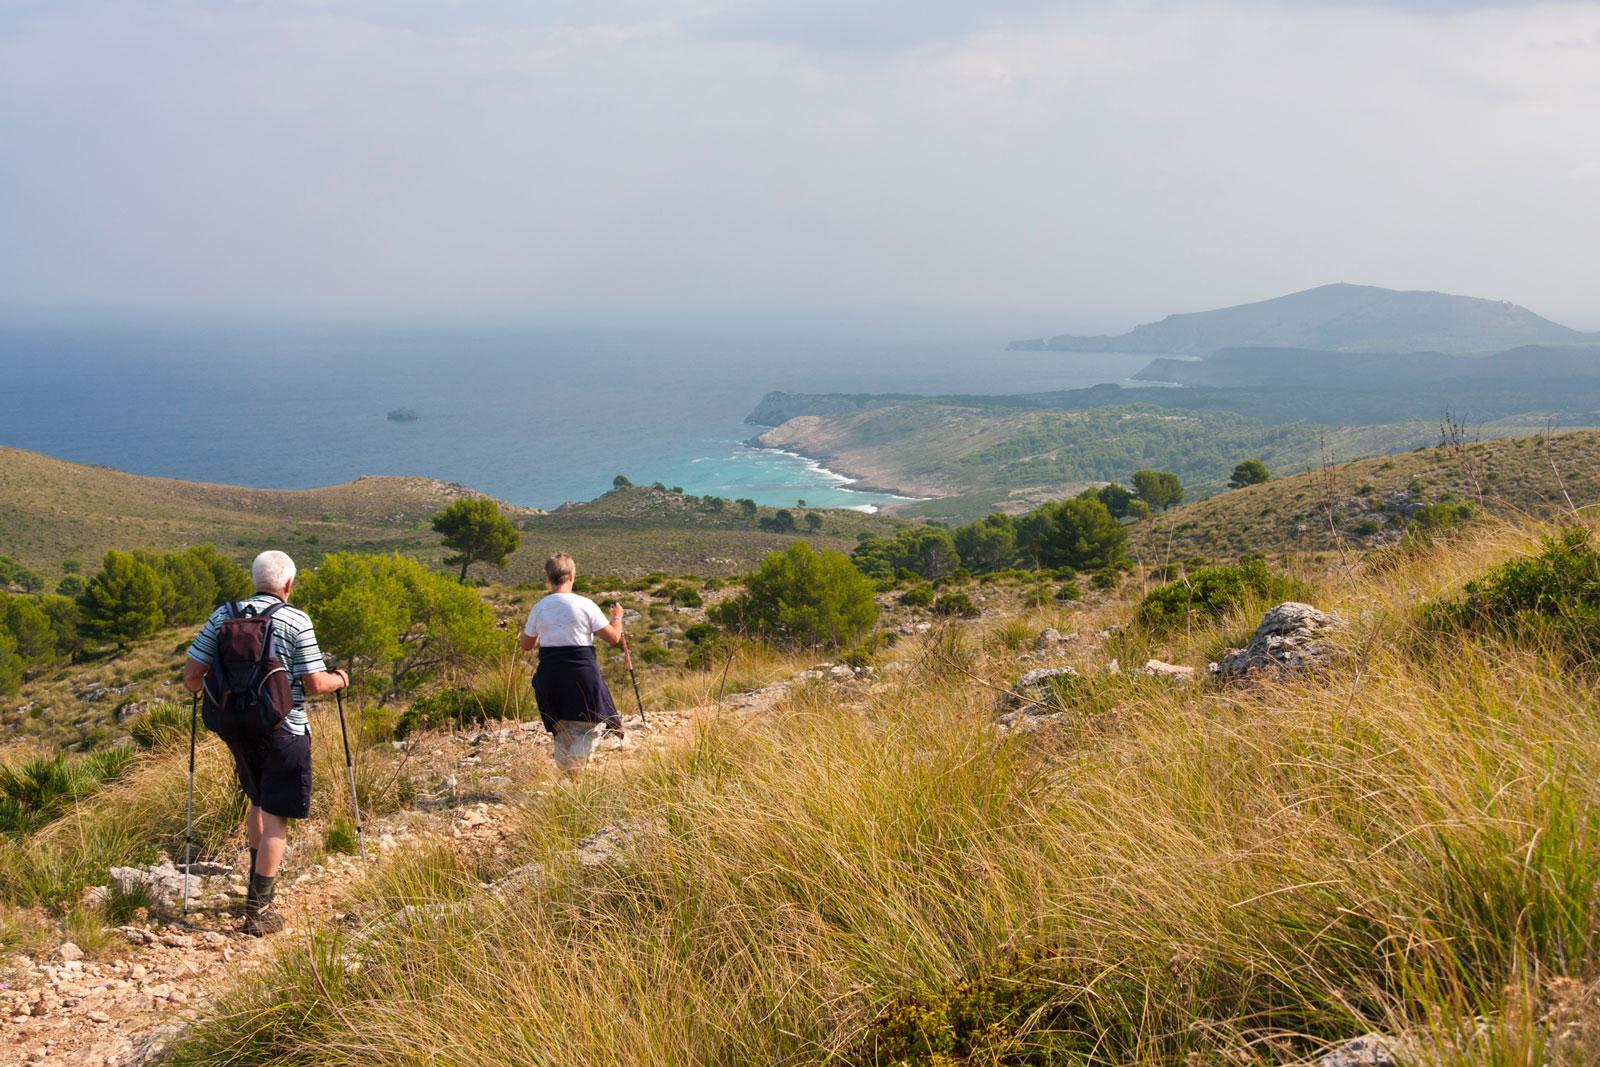 Lebensabend im Süden: Senioren auf Mallorca